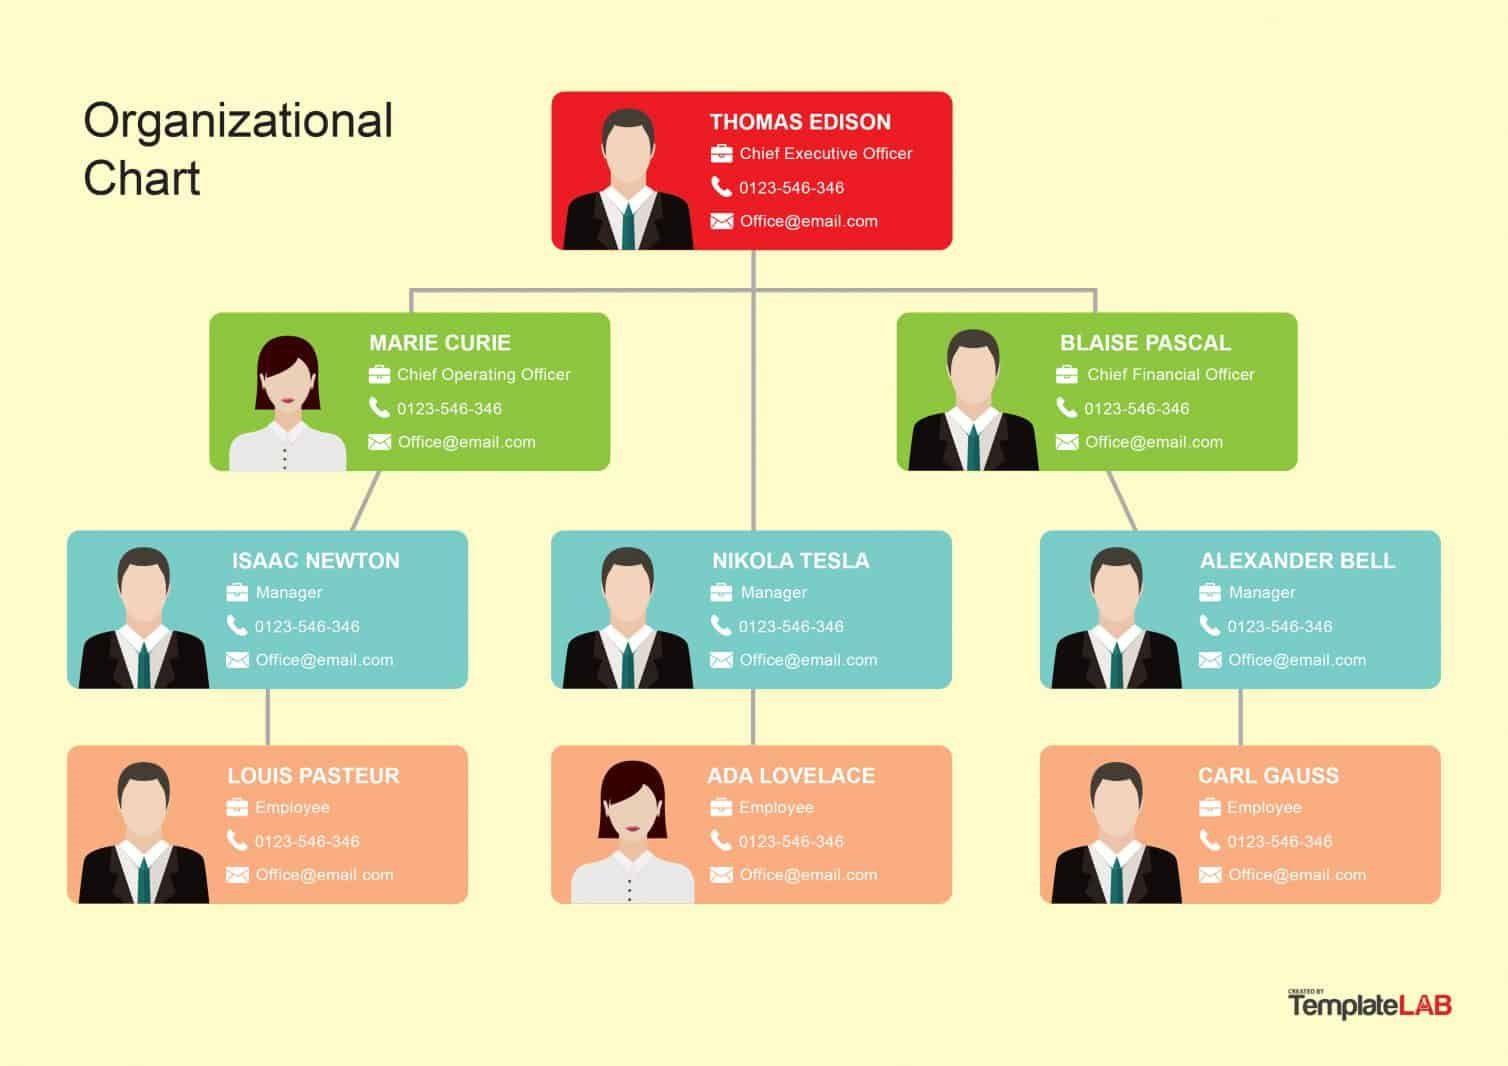 008 Astounding Free Organizational Chart Template Excel 2010 High Resolution Full